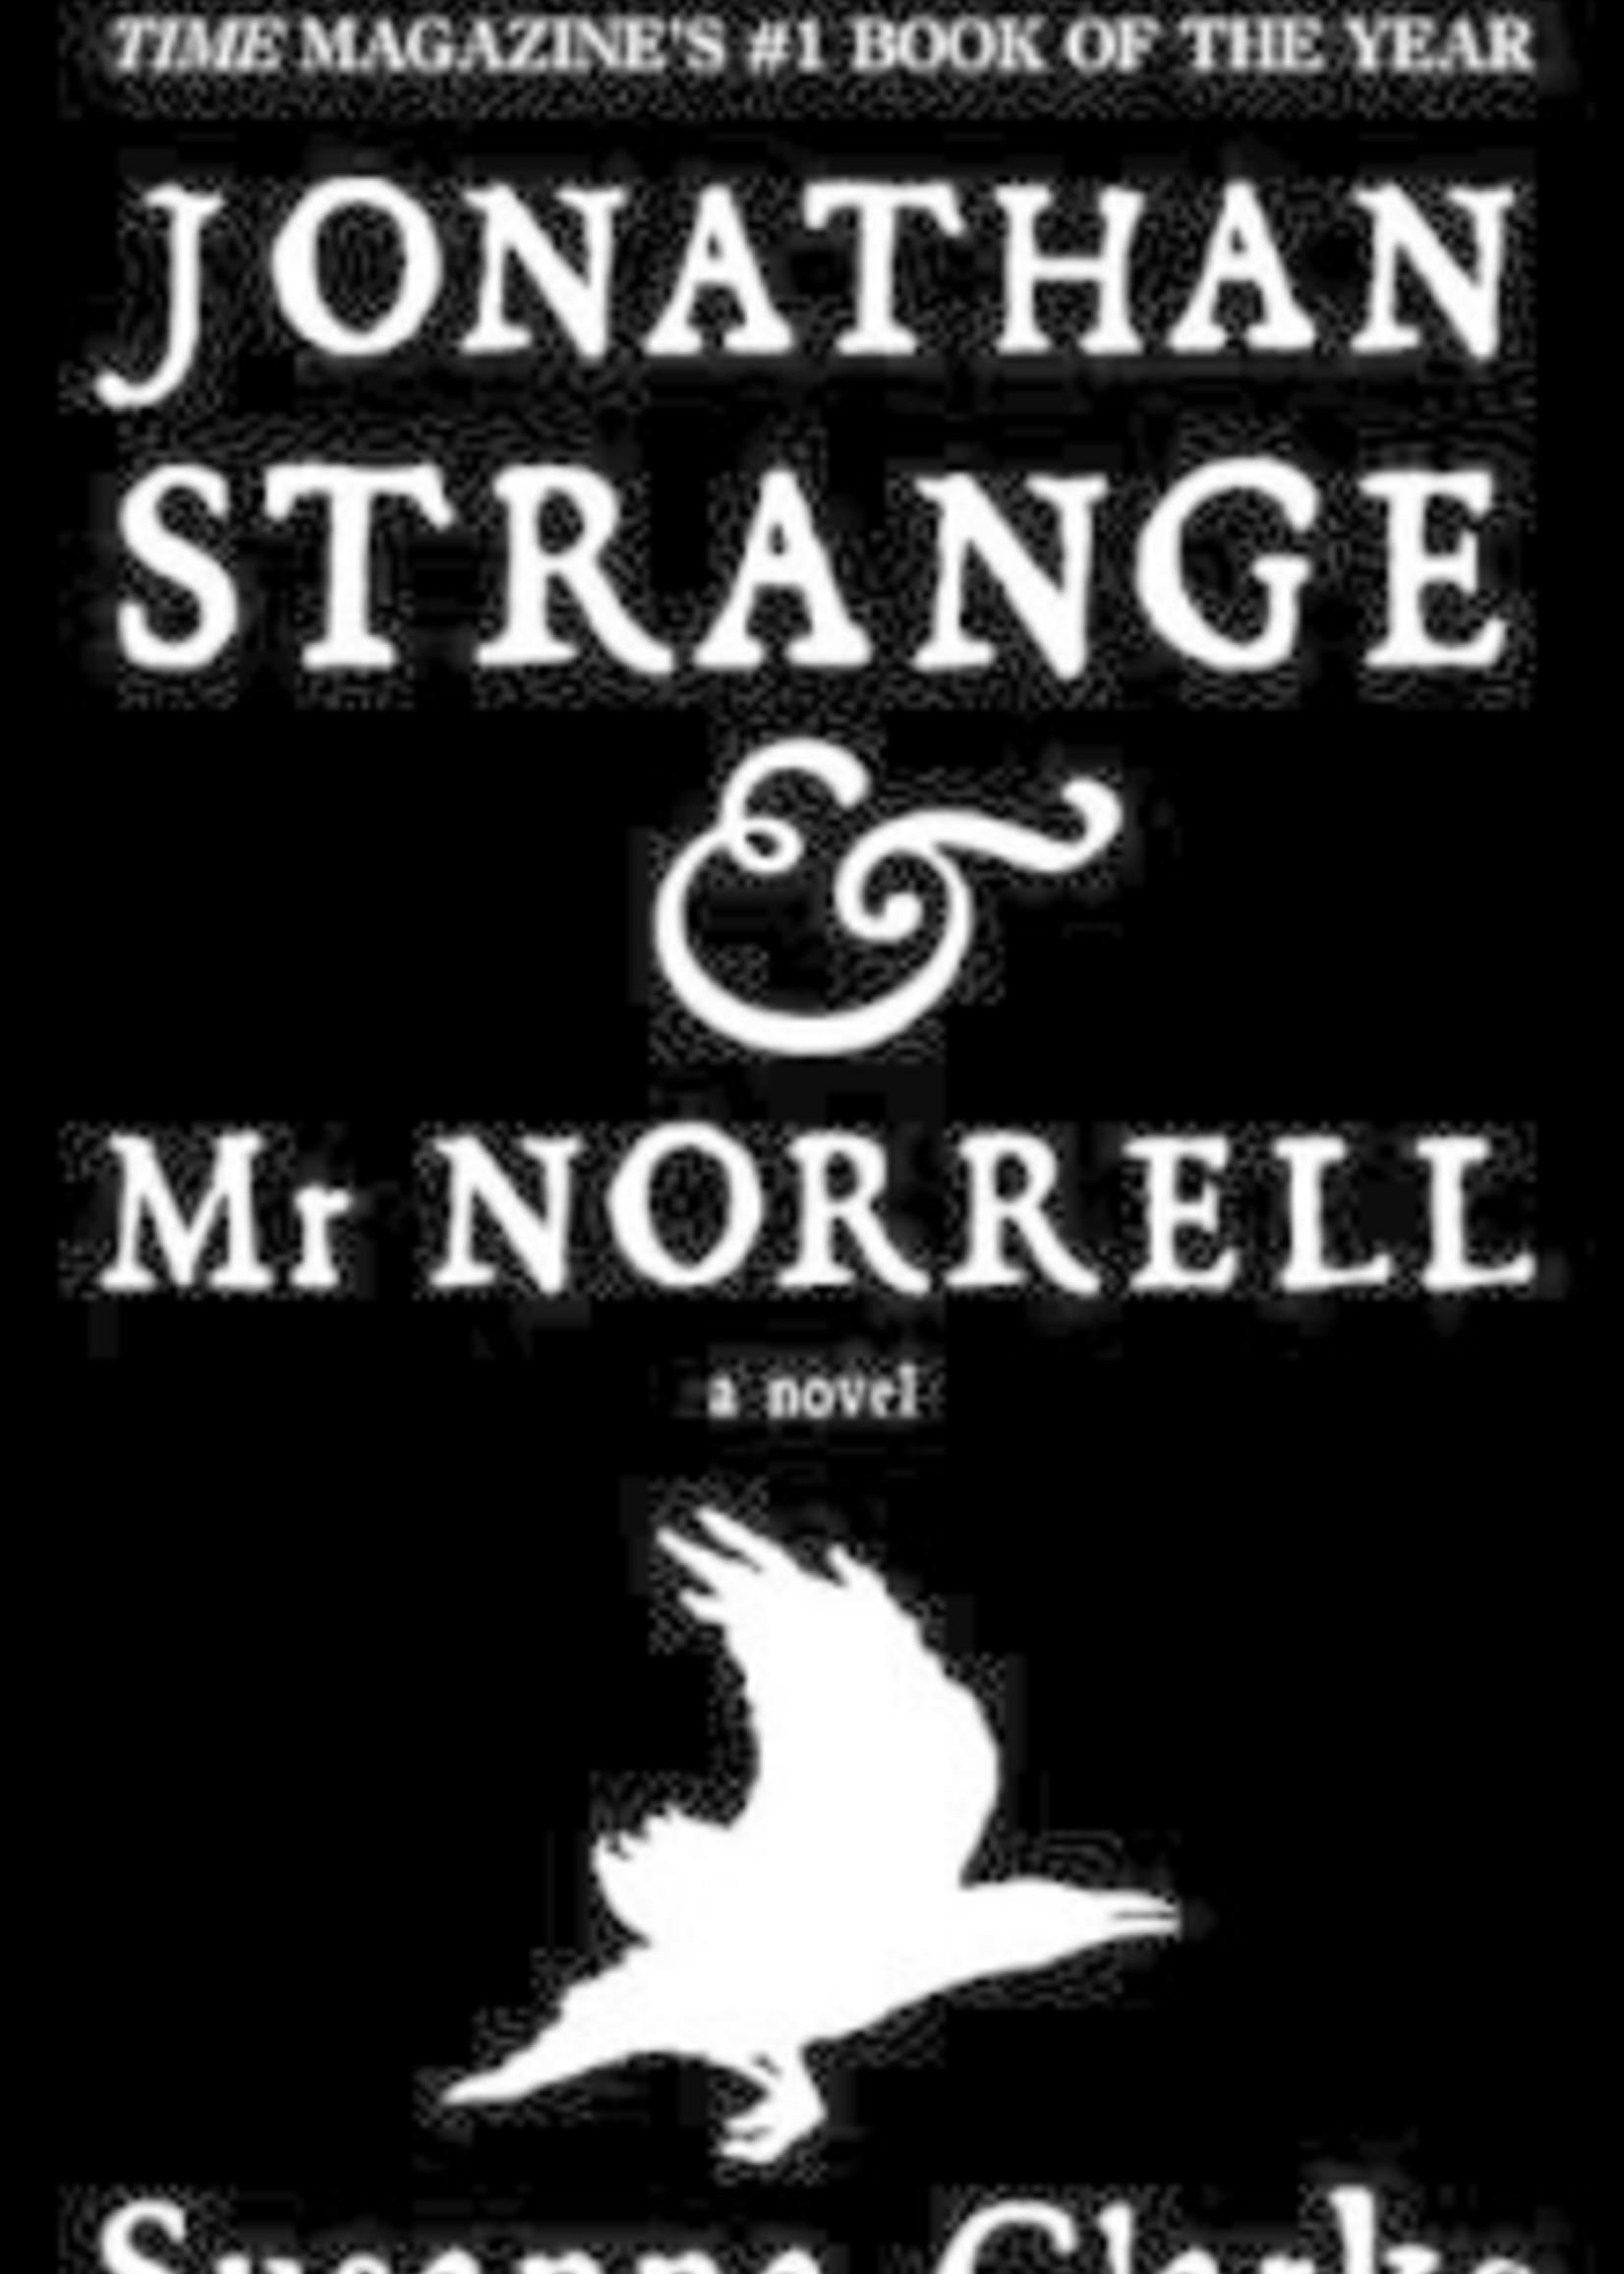 Johnathan Strange & Mr. Norrell by Susanna Clarke